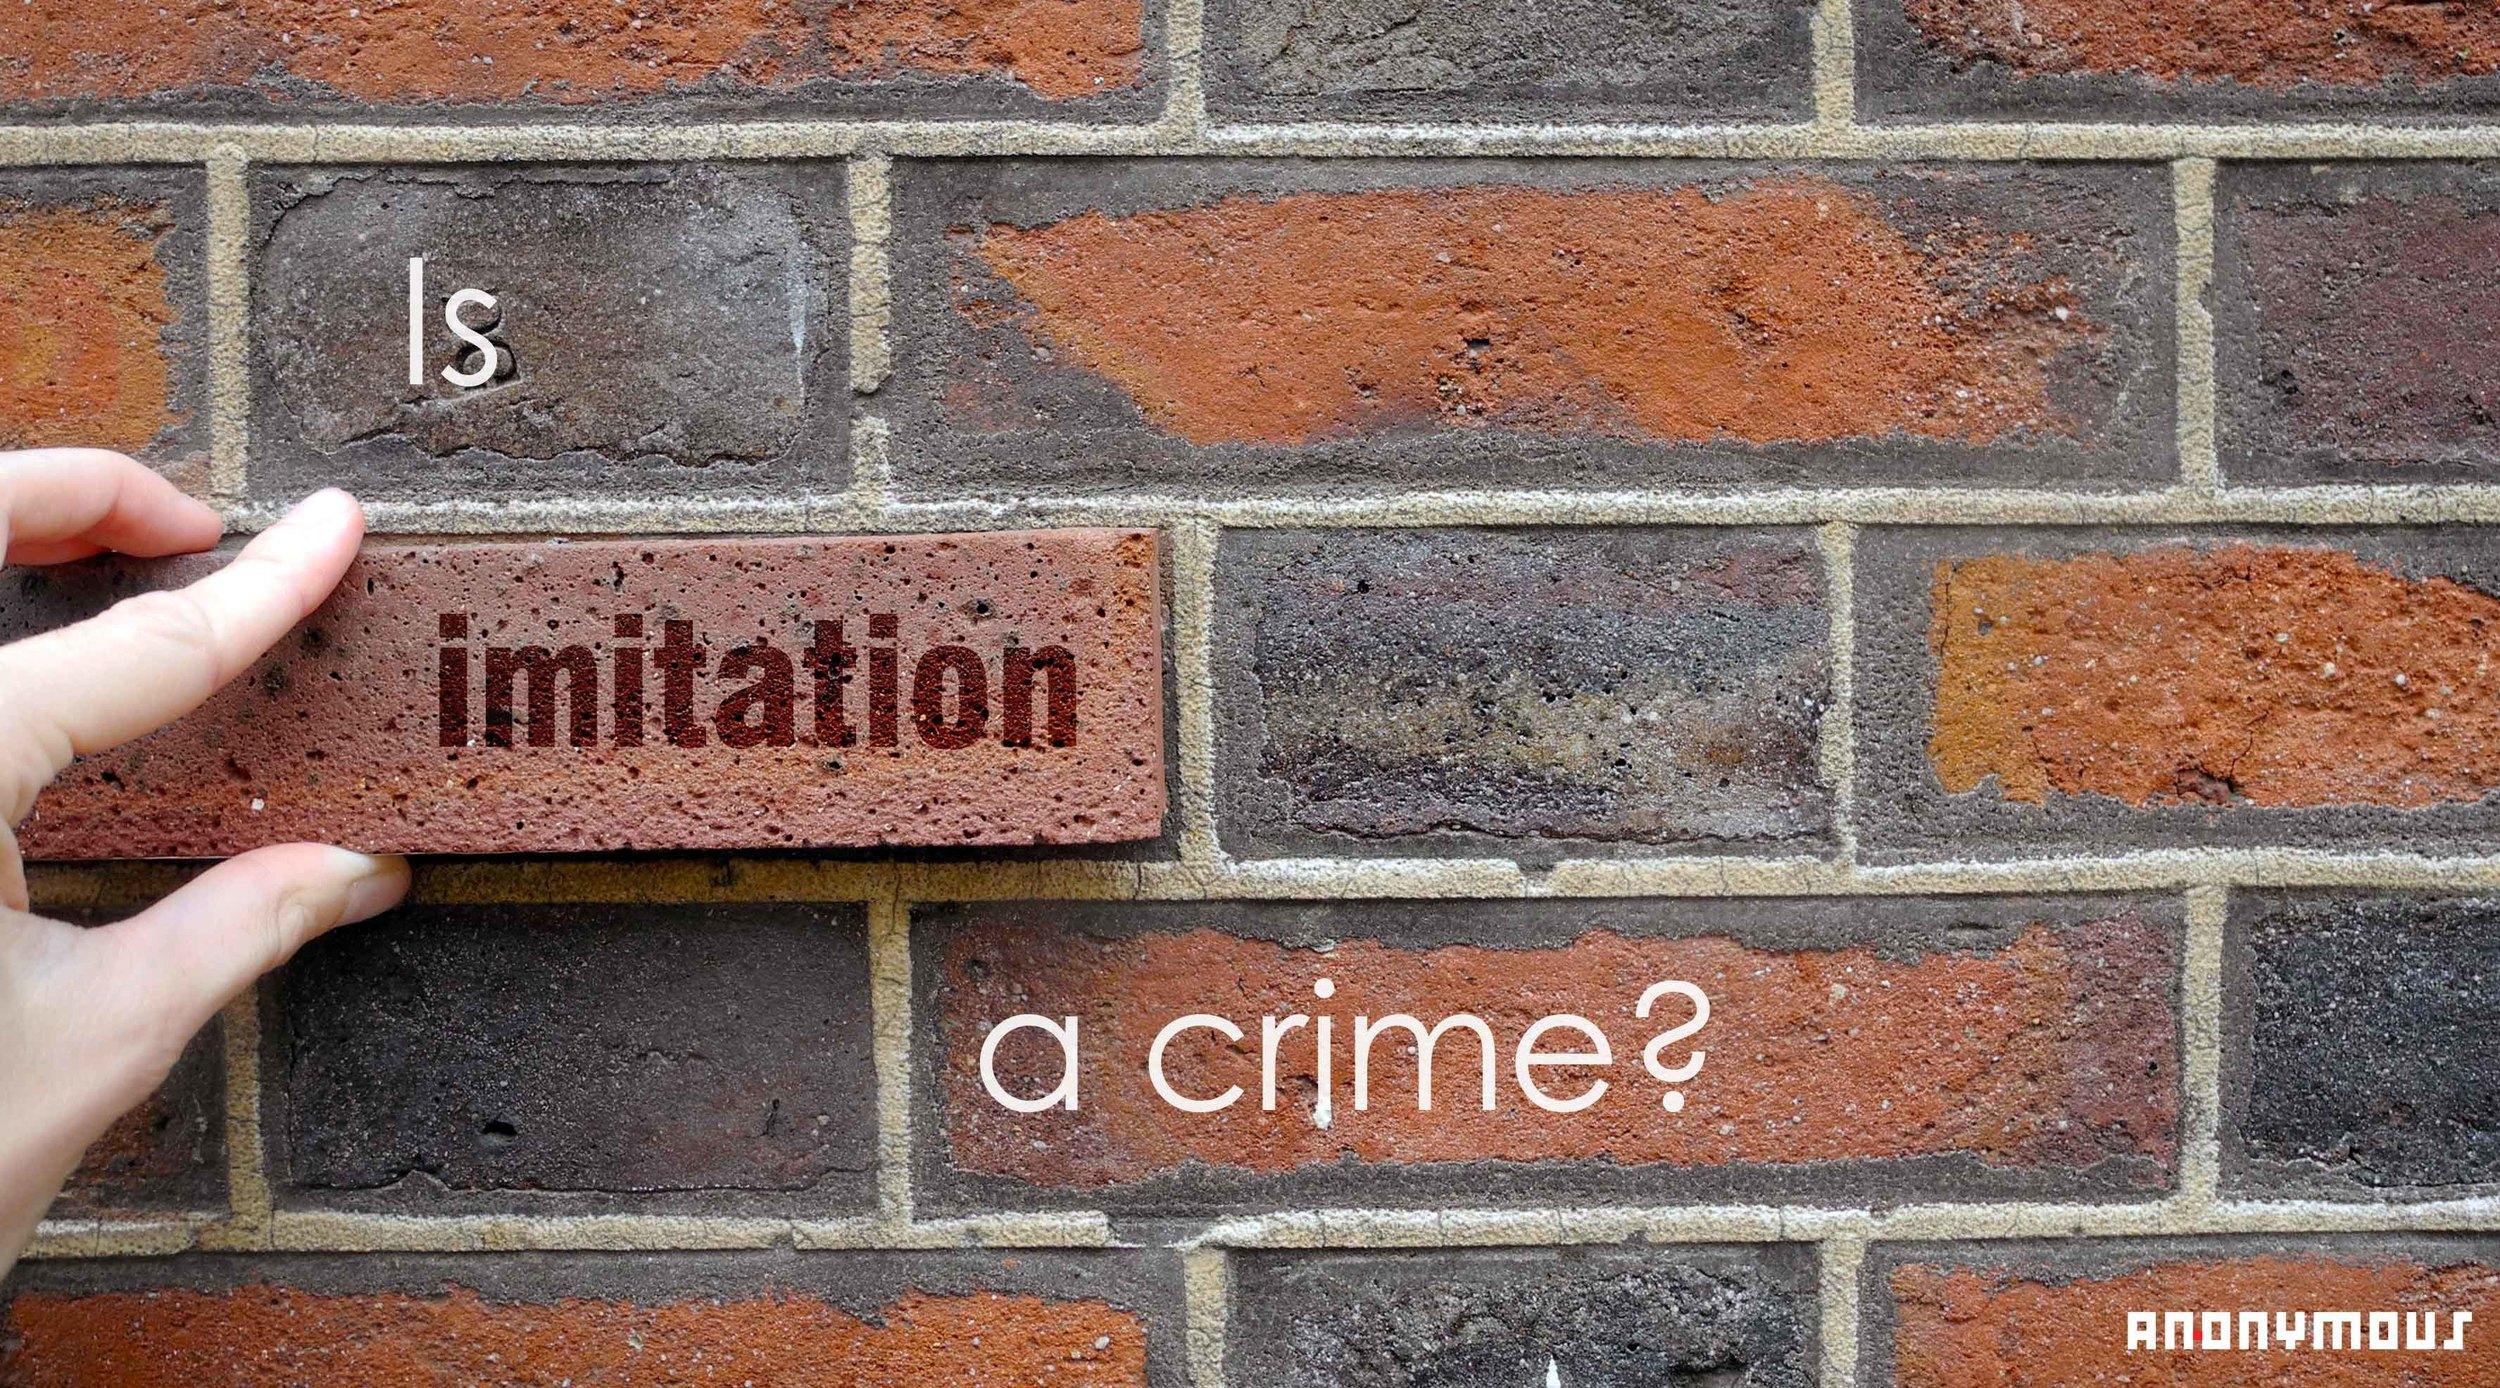 Imitation crime